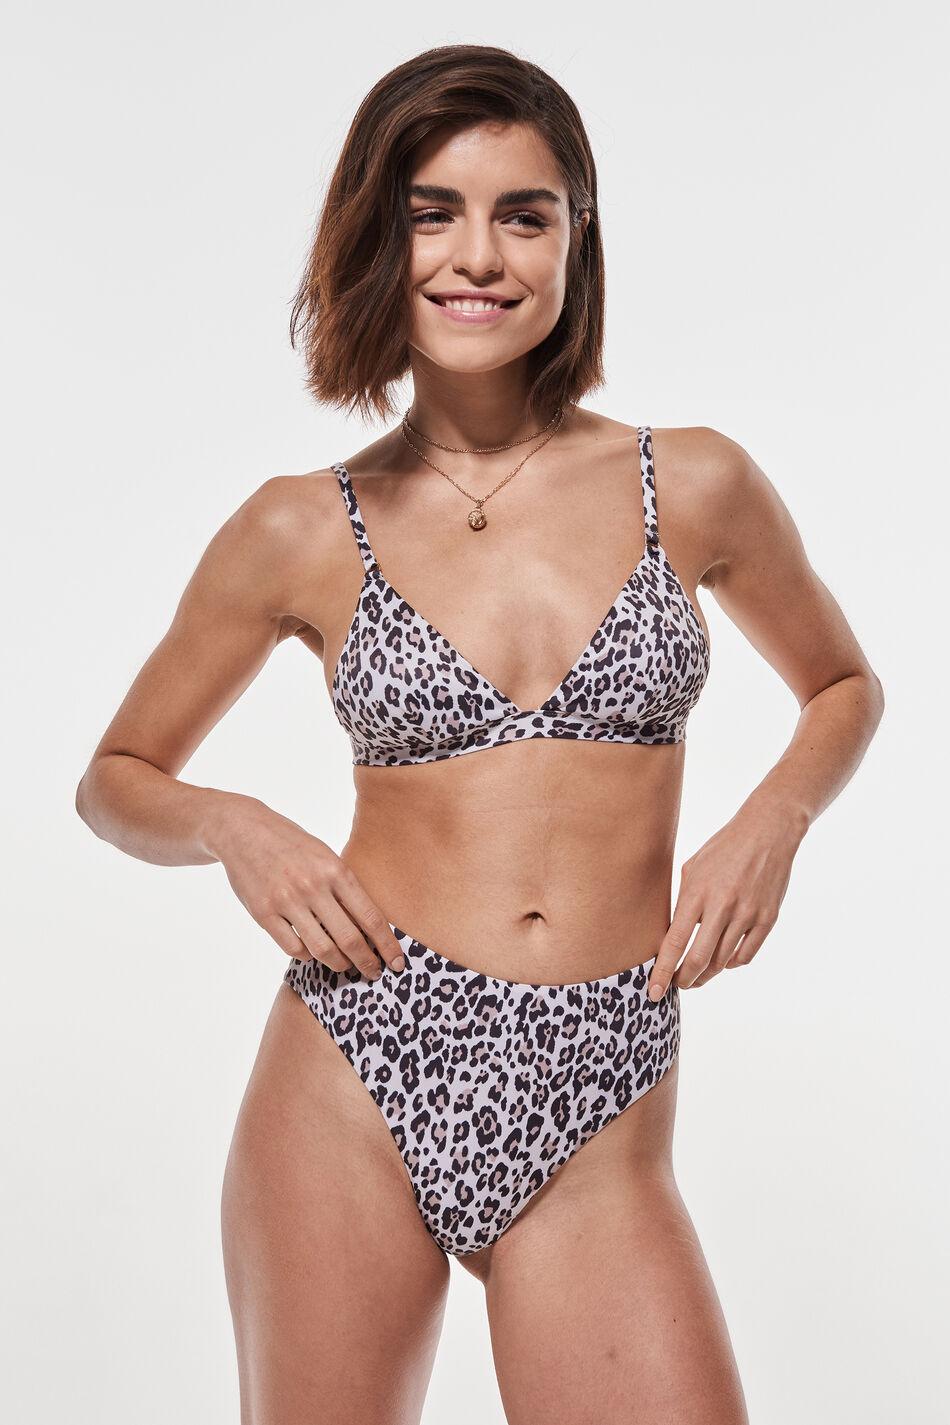 Gina Tricot Nina highwaist bikini brief XL Female Leo/aop